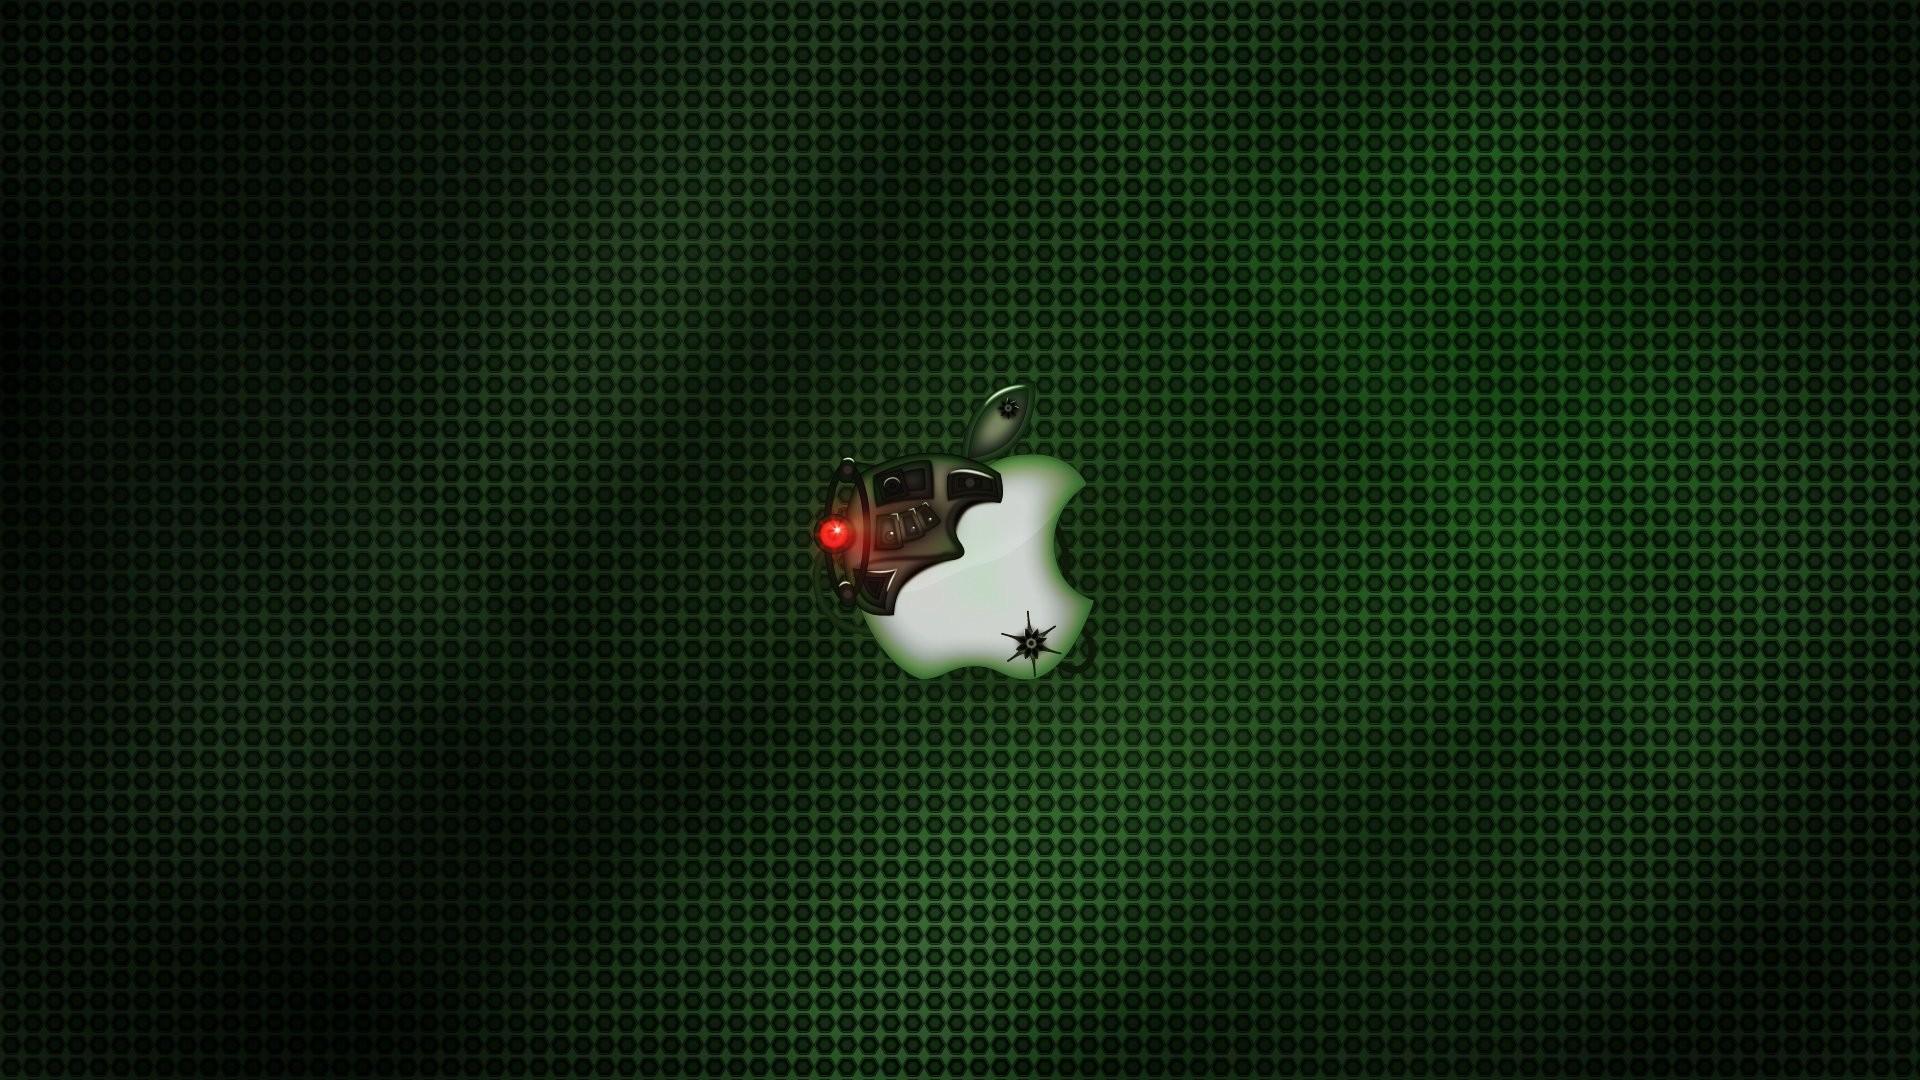 Technology – Apple Wallpaper